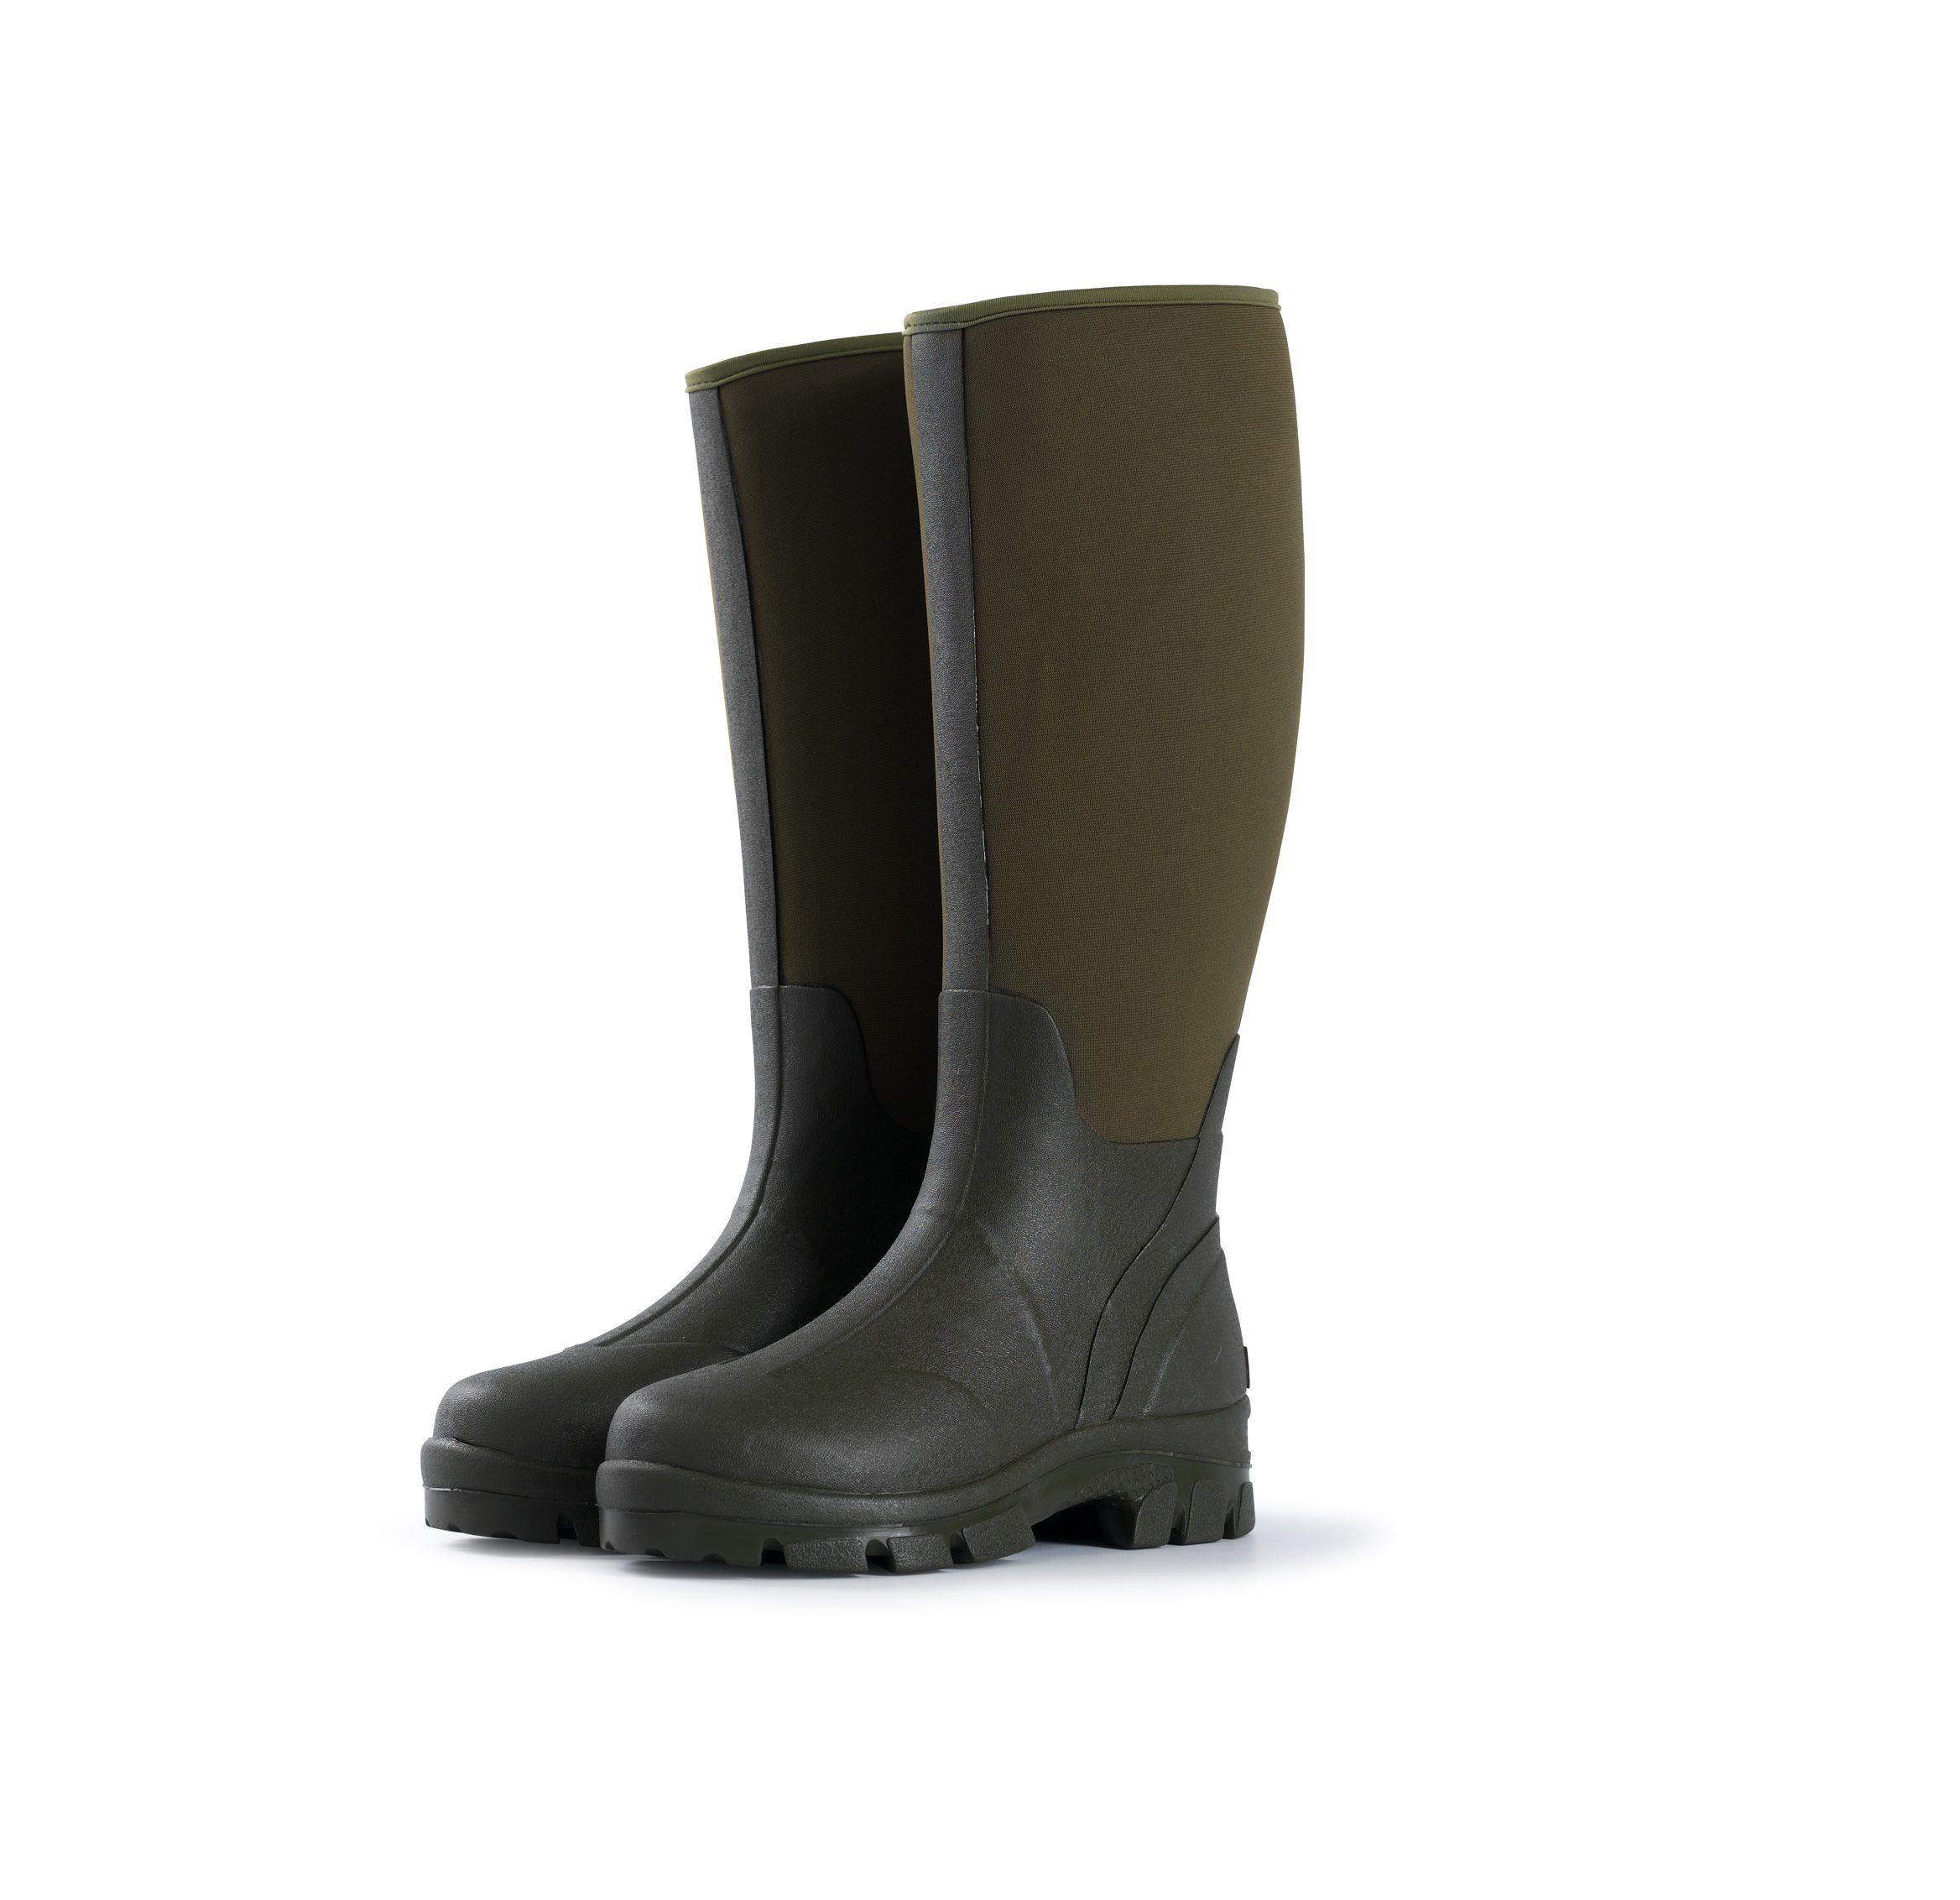 Stormafit Neoprene Boots